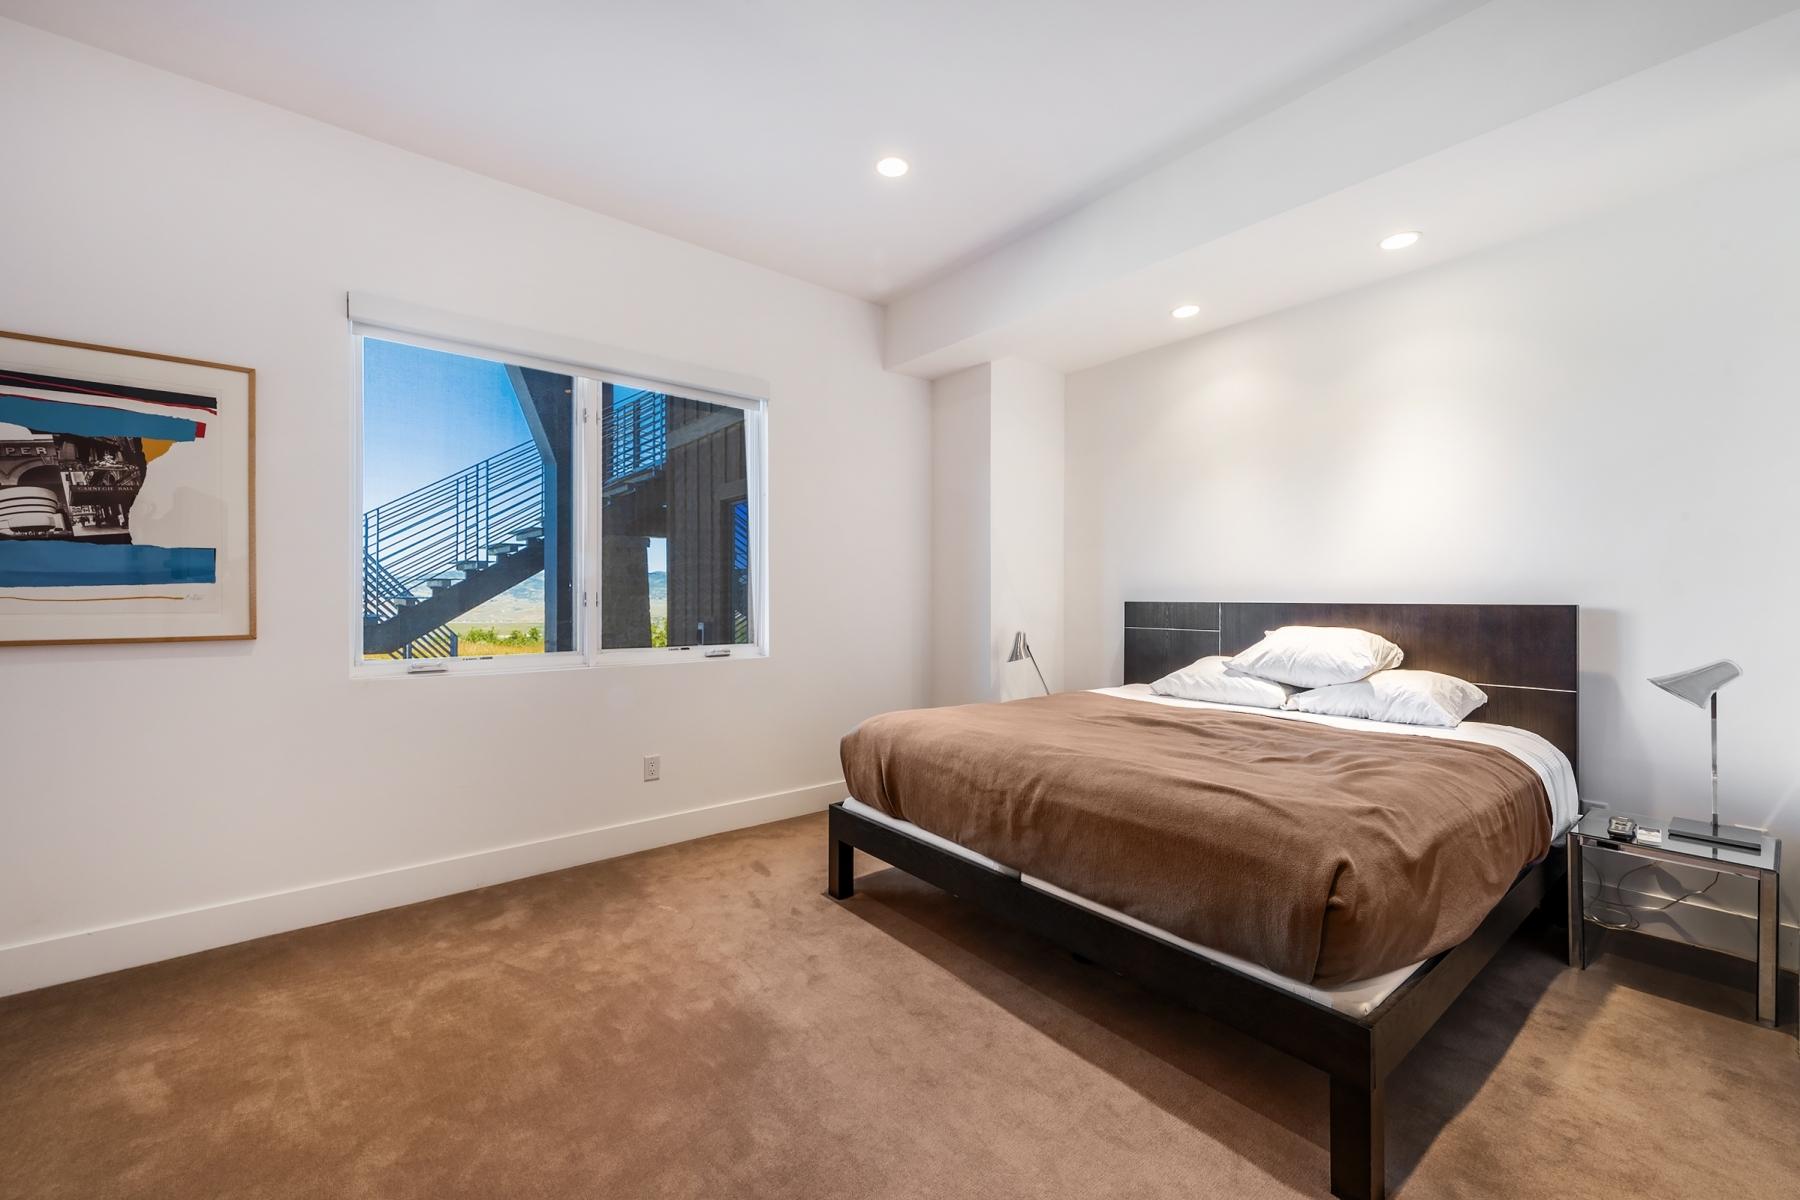 29. Bedroom-Four_1800x1200_3340208.jpg